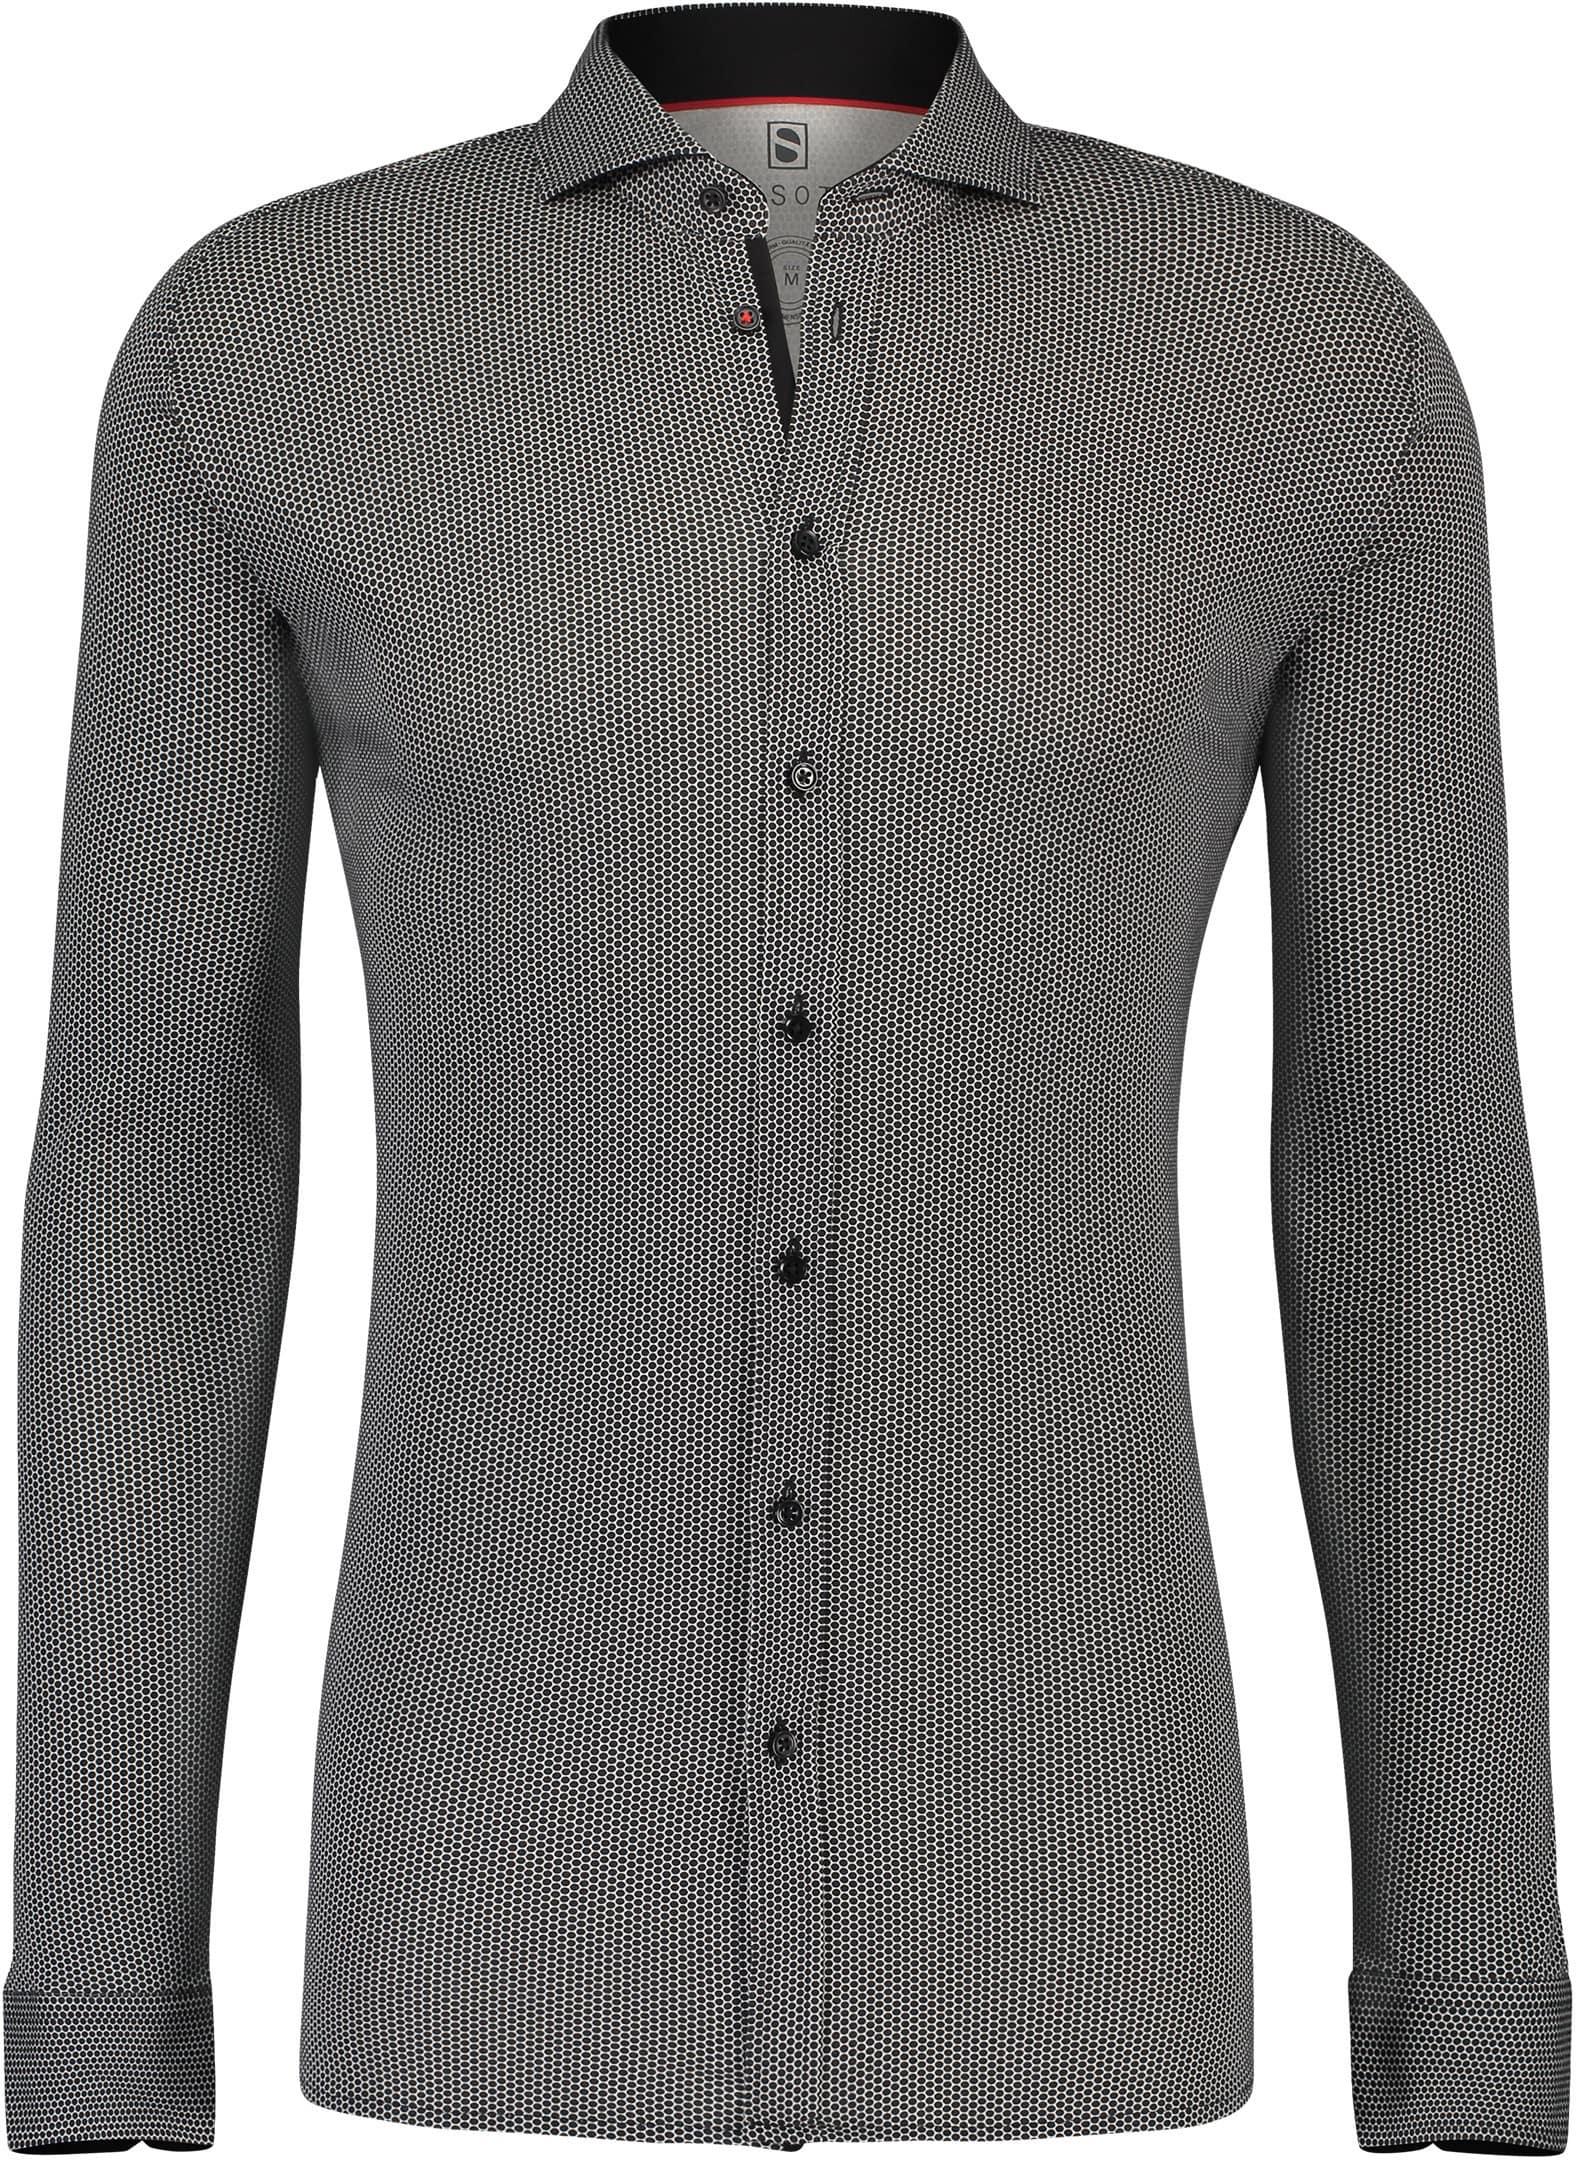 Desoto Overhemd Strijkvrij Stippen Zwart foto 0